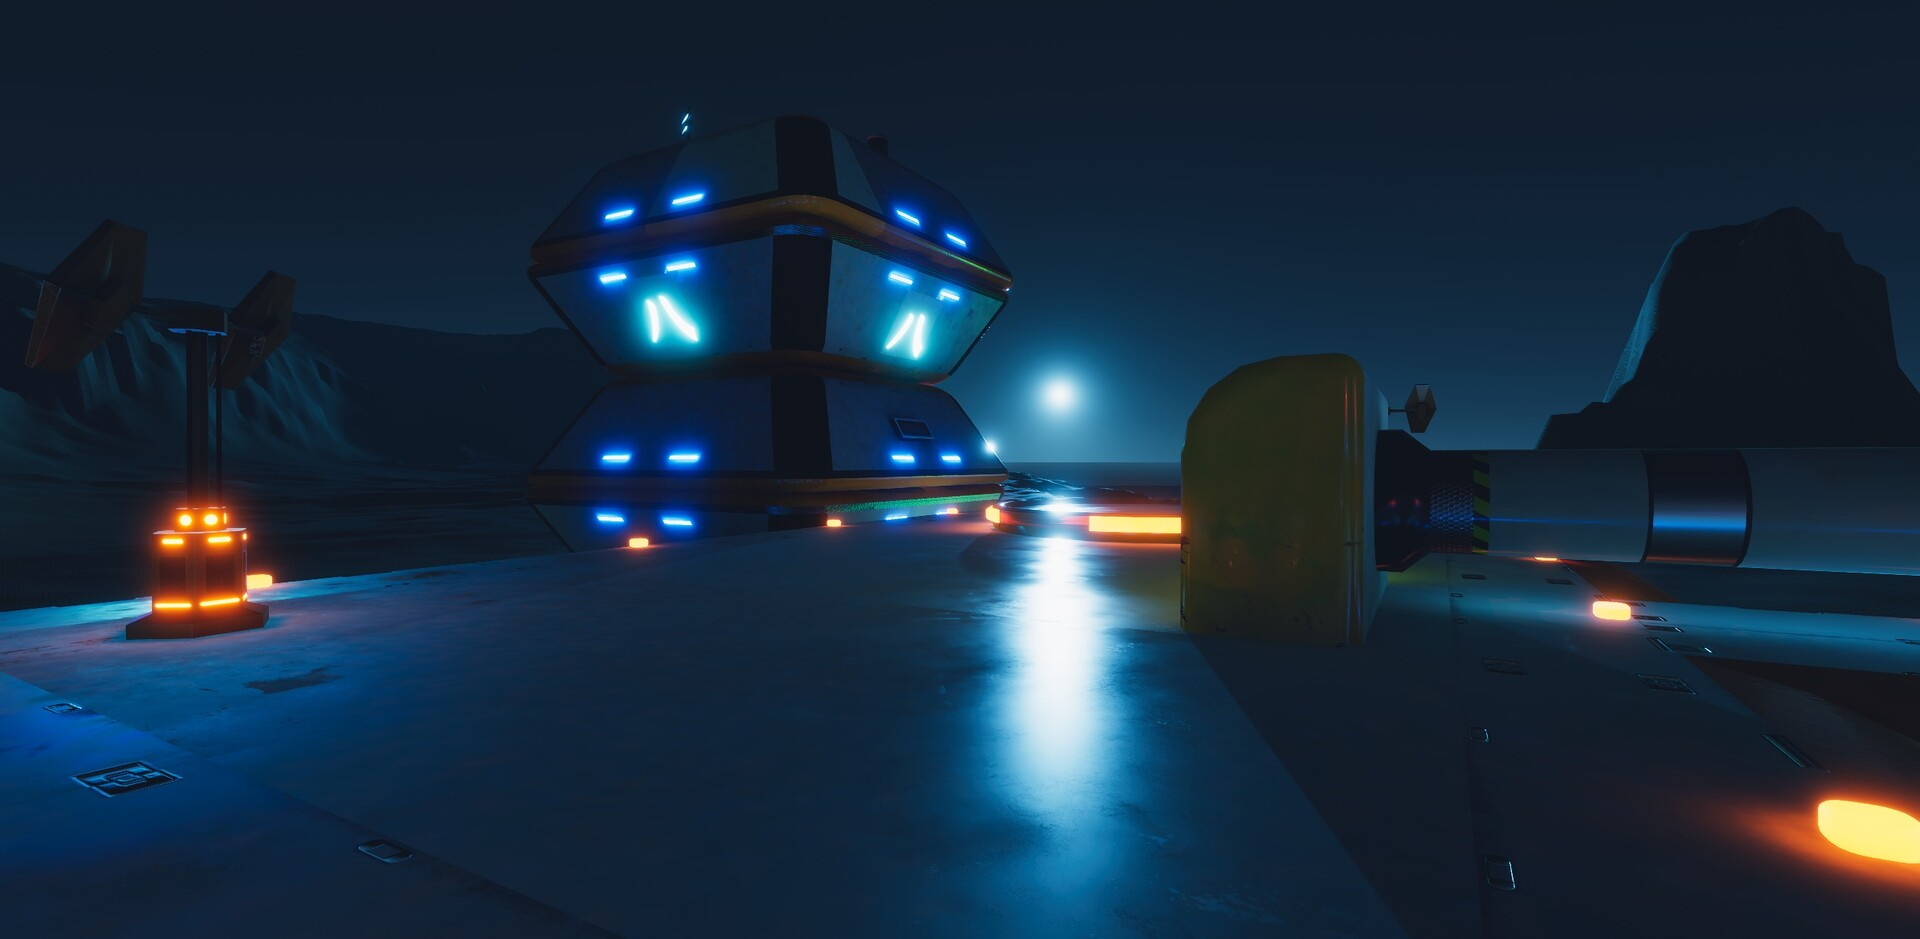 Enrico ottonello screenshot05 sci fi building exterior pack gameartifact